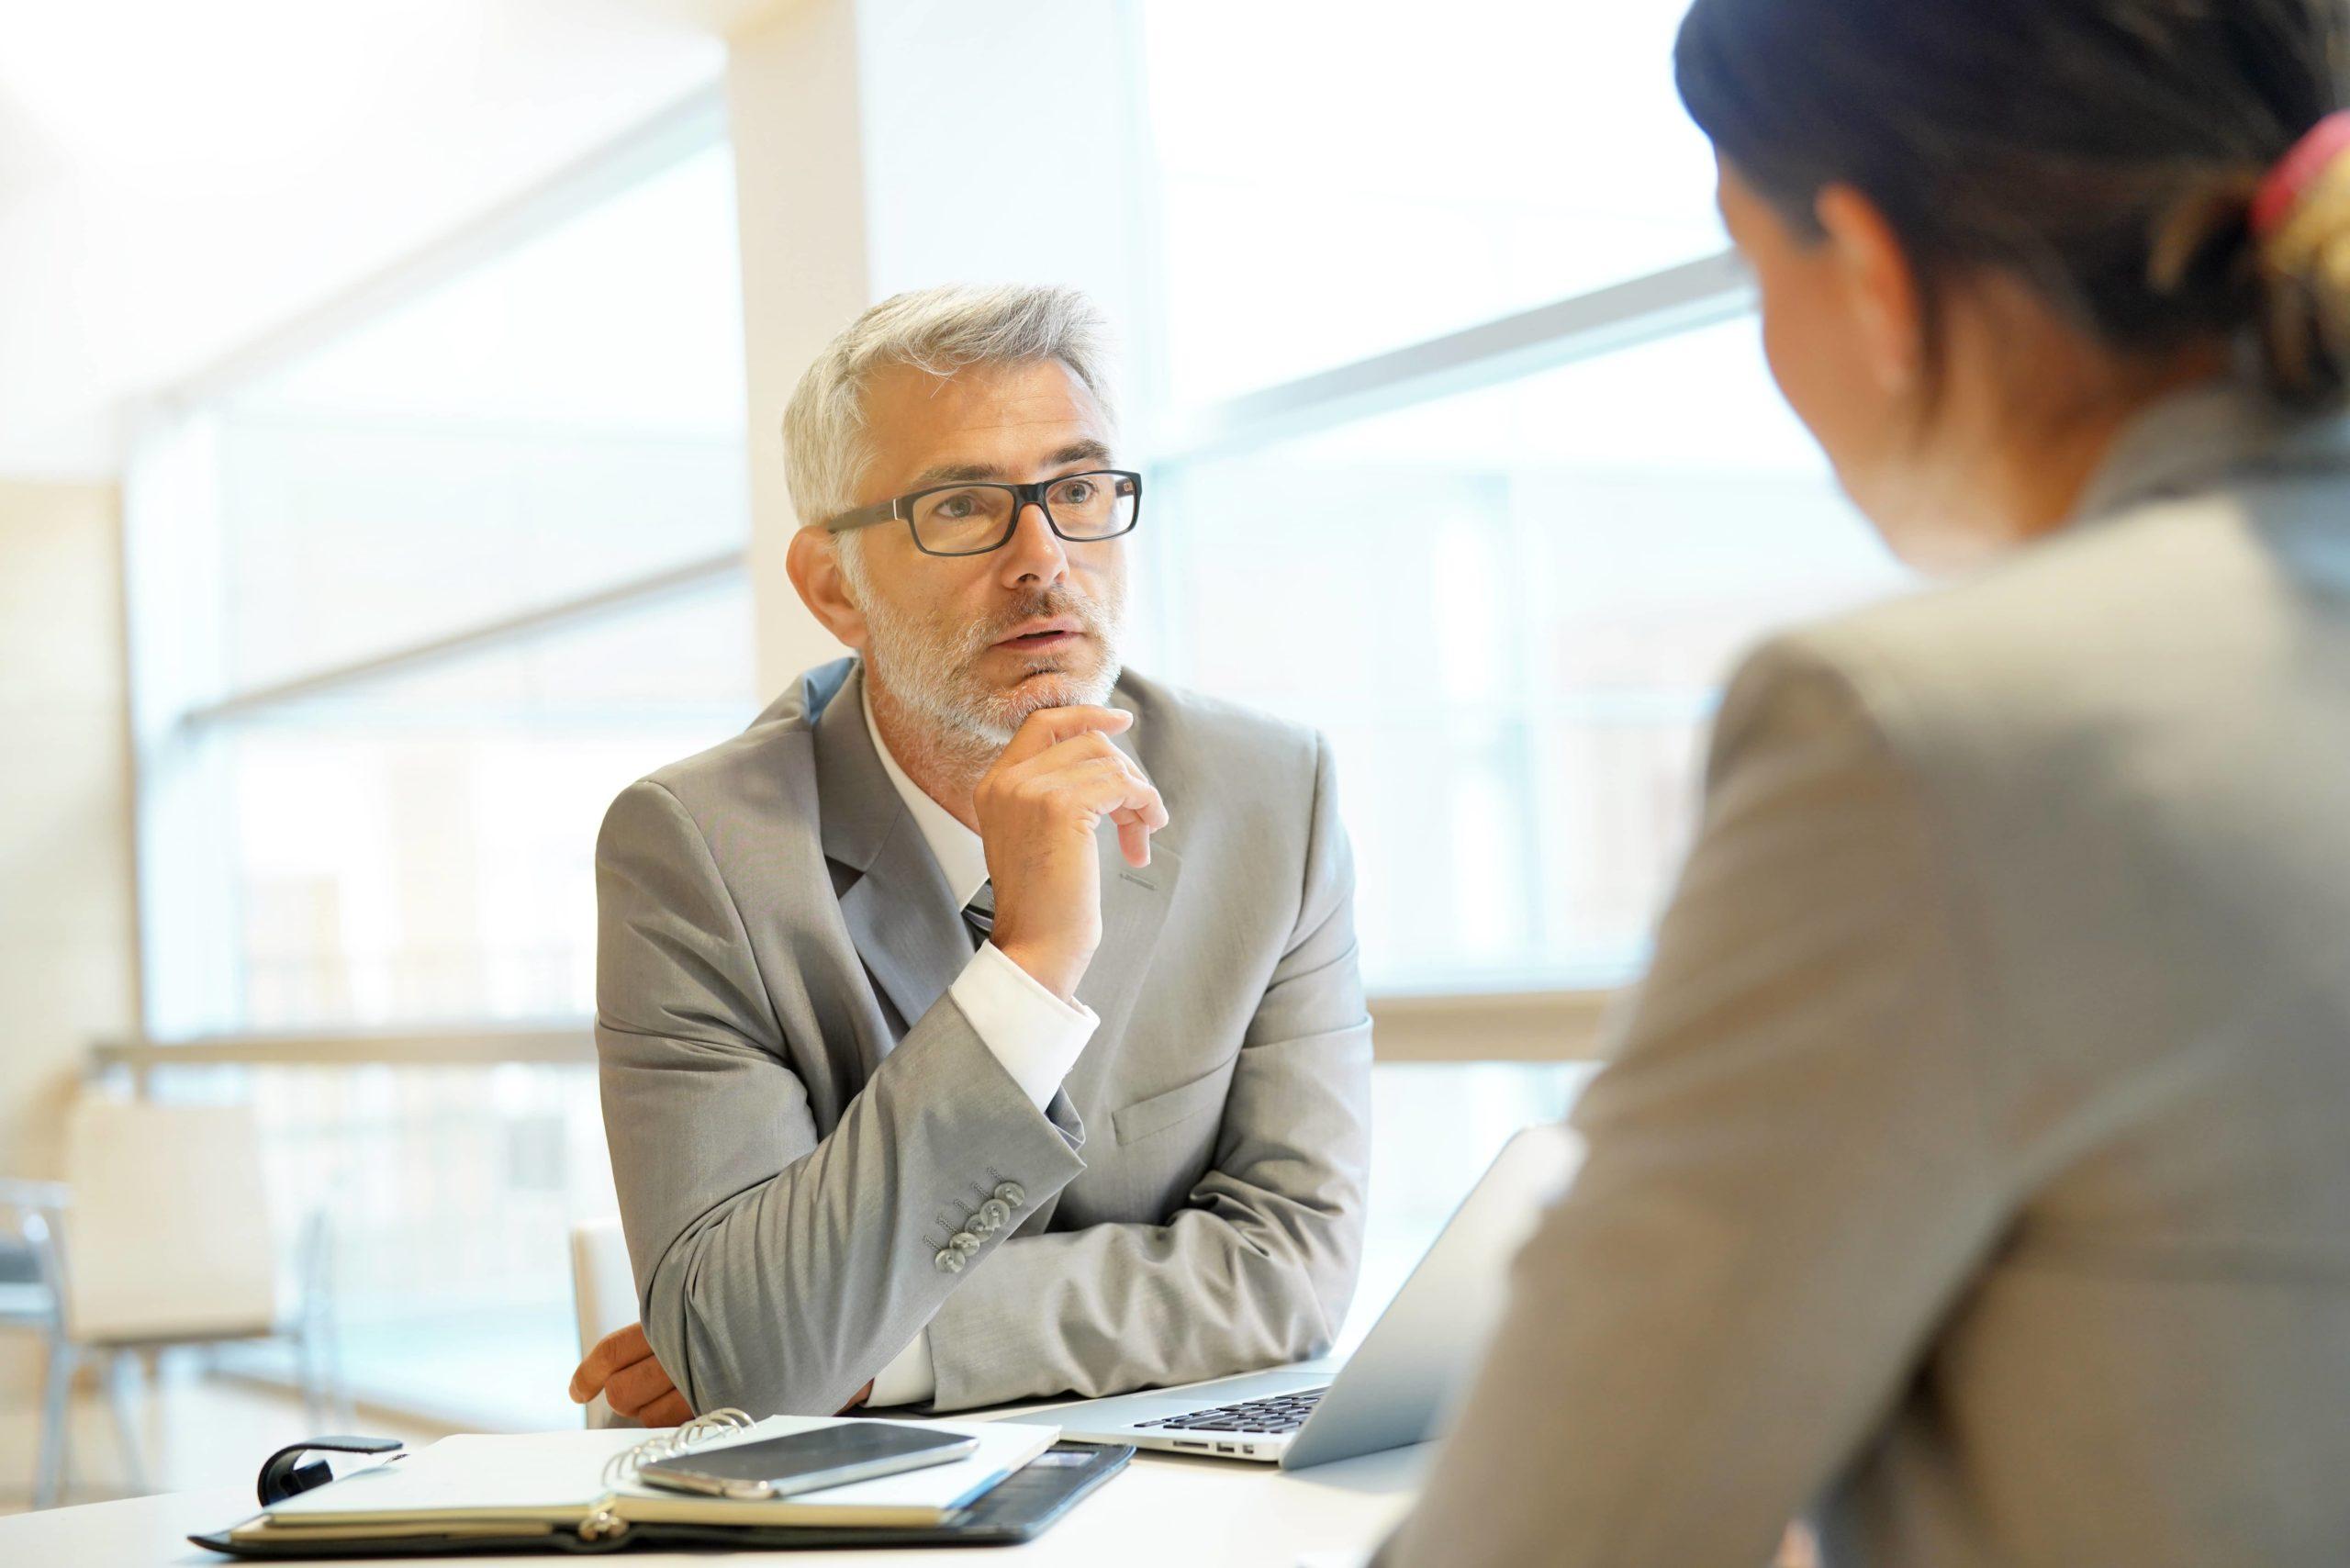 entretien-professionnel-avec-consultant